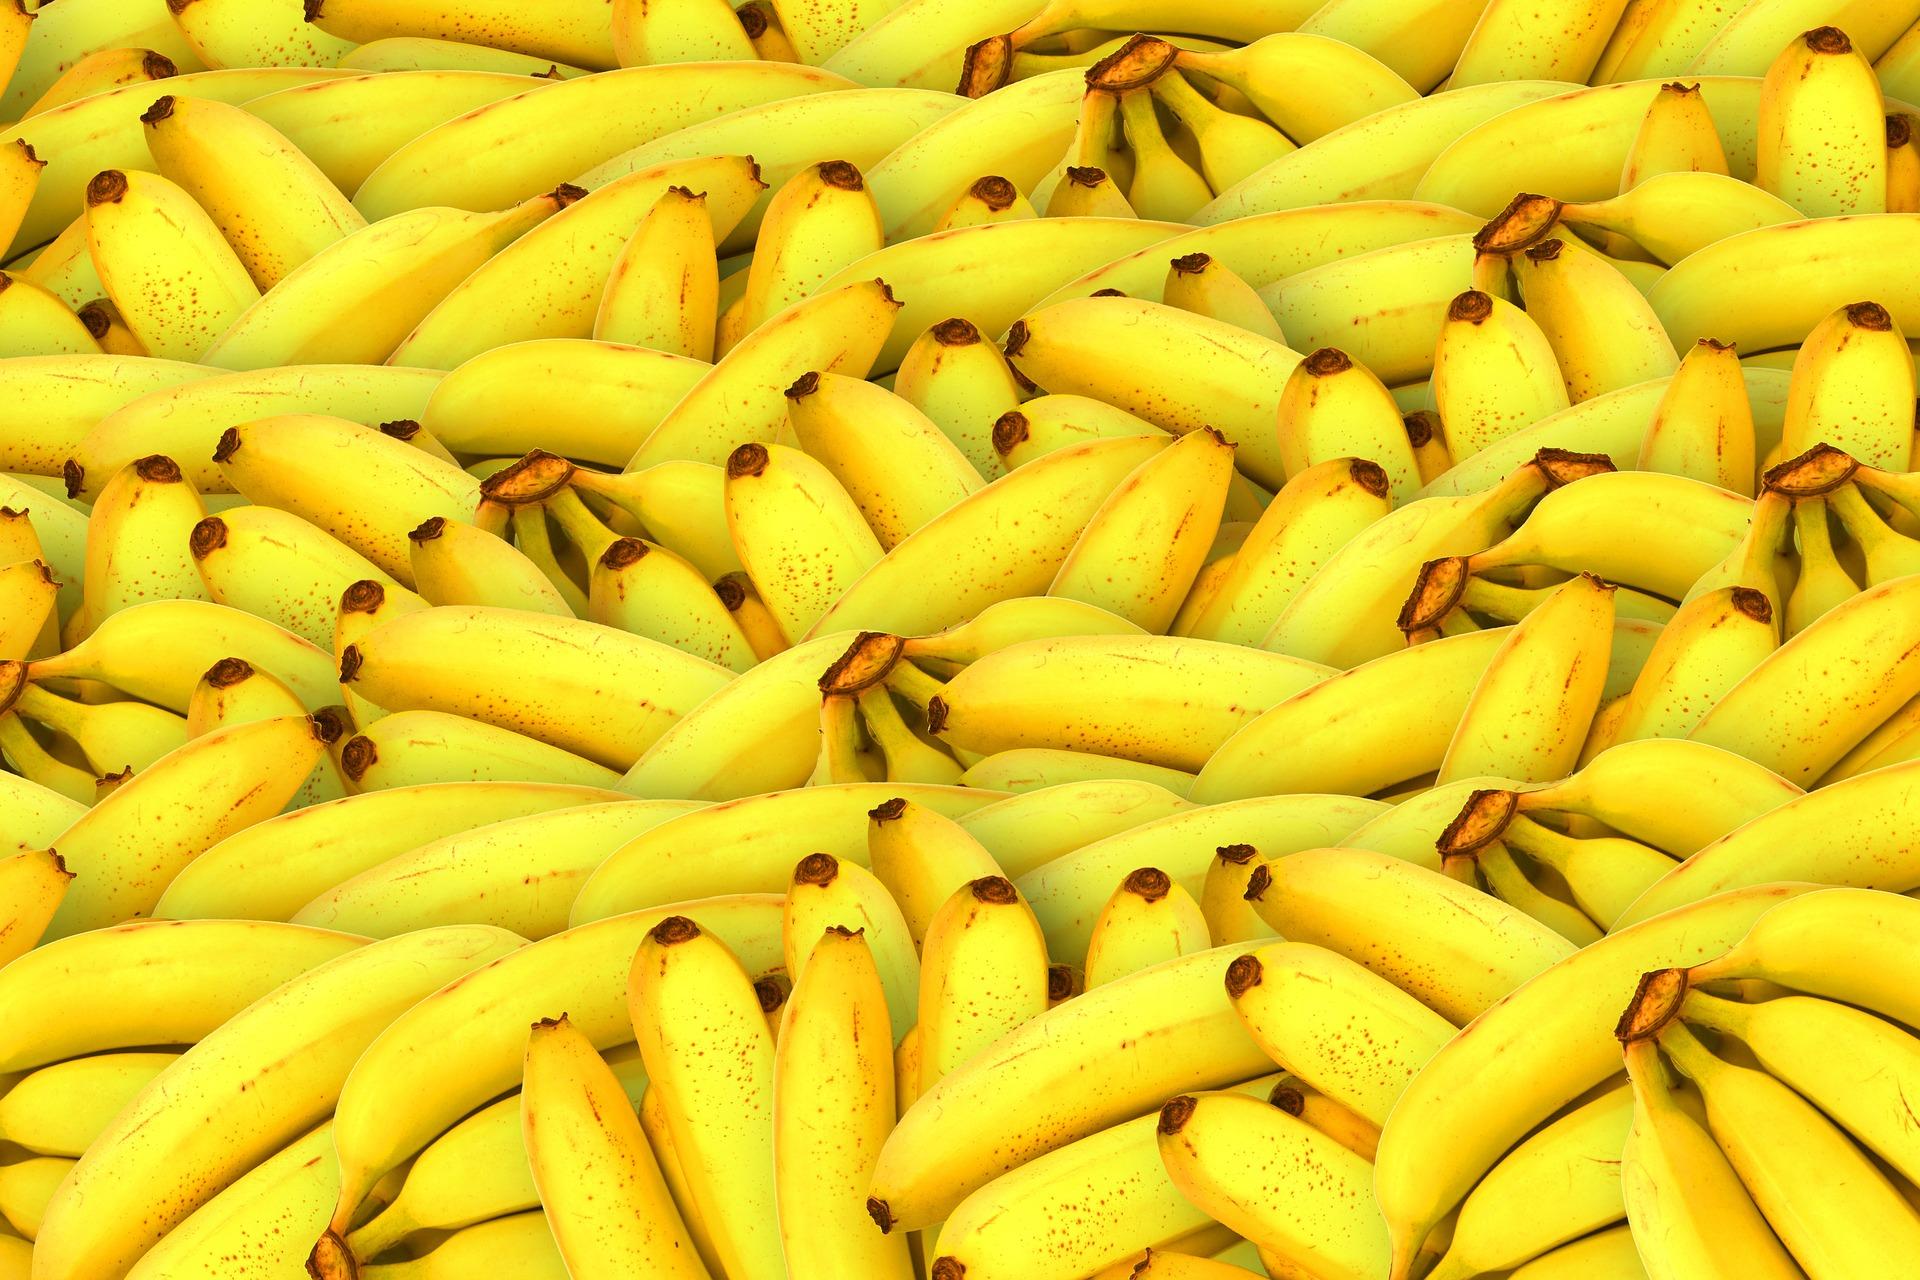 Chiquita wil voedselverspilling terugdringen